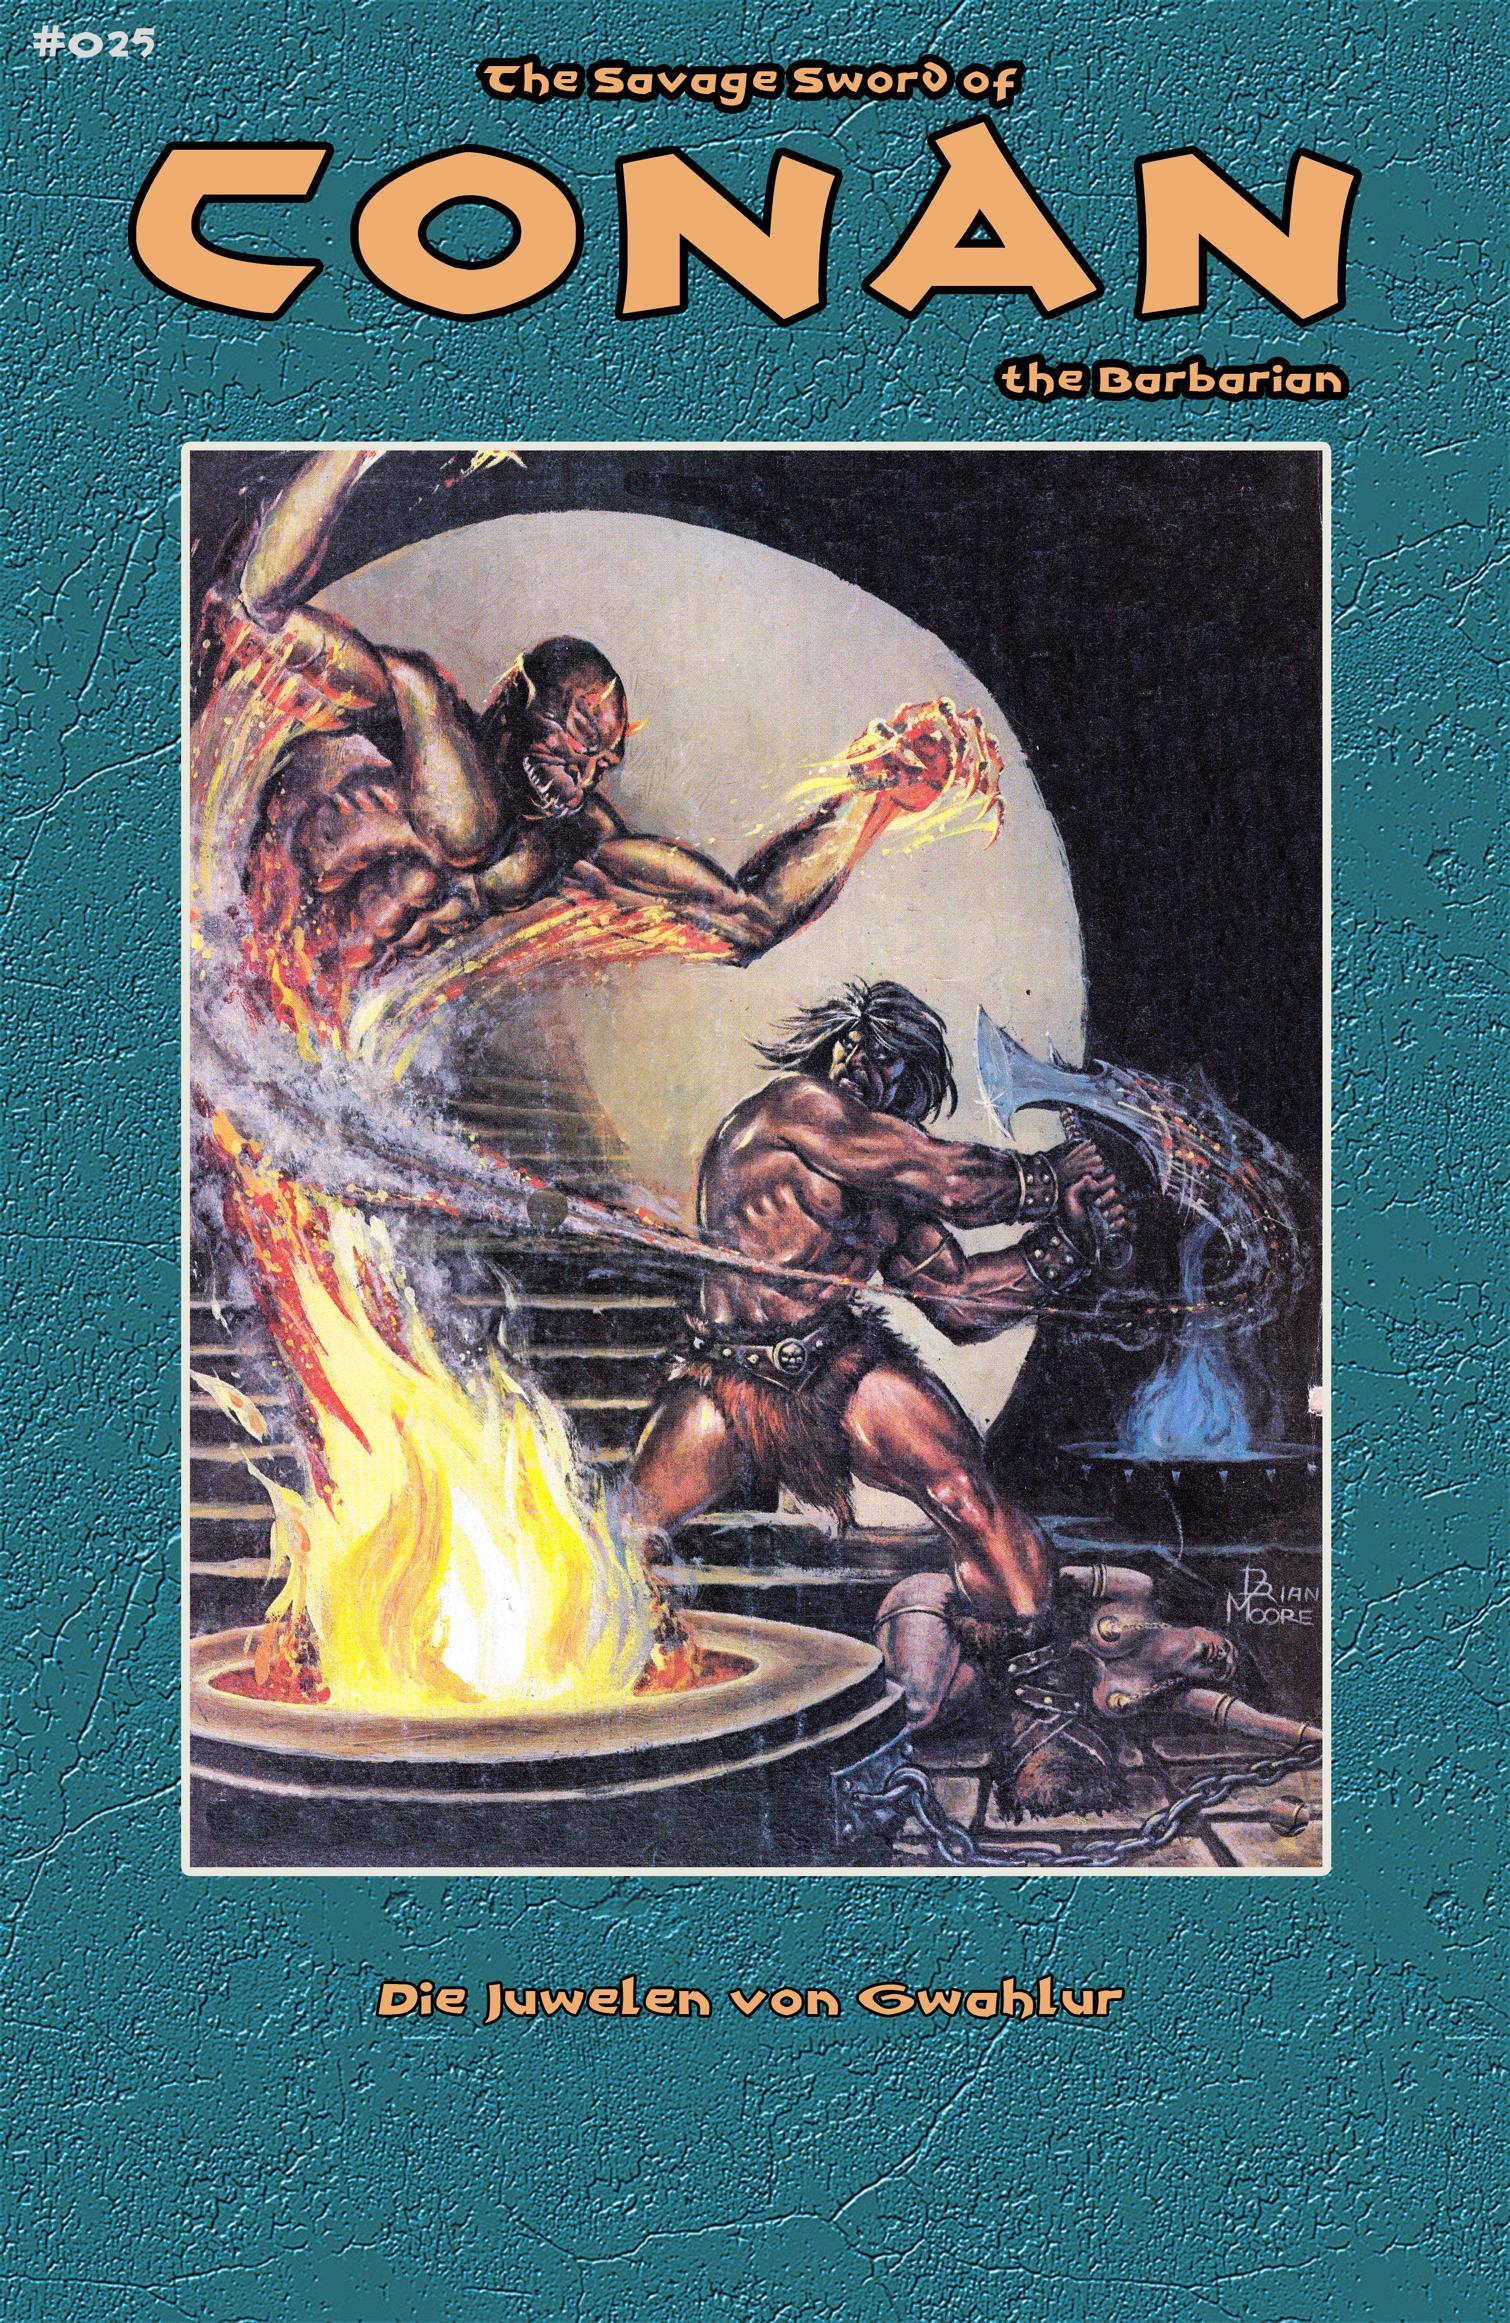 The Savage Sword of Conan 025 (Scanlation #733) (2019)